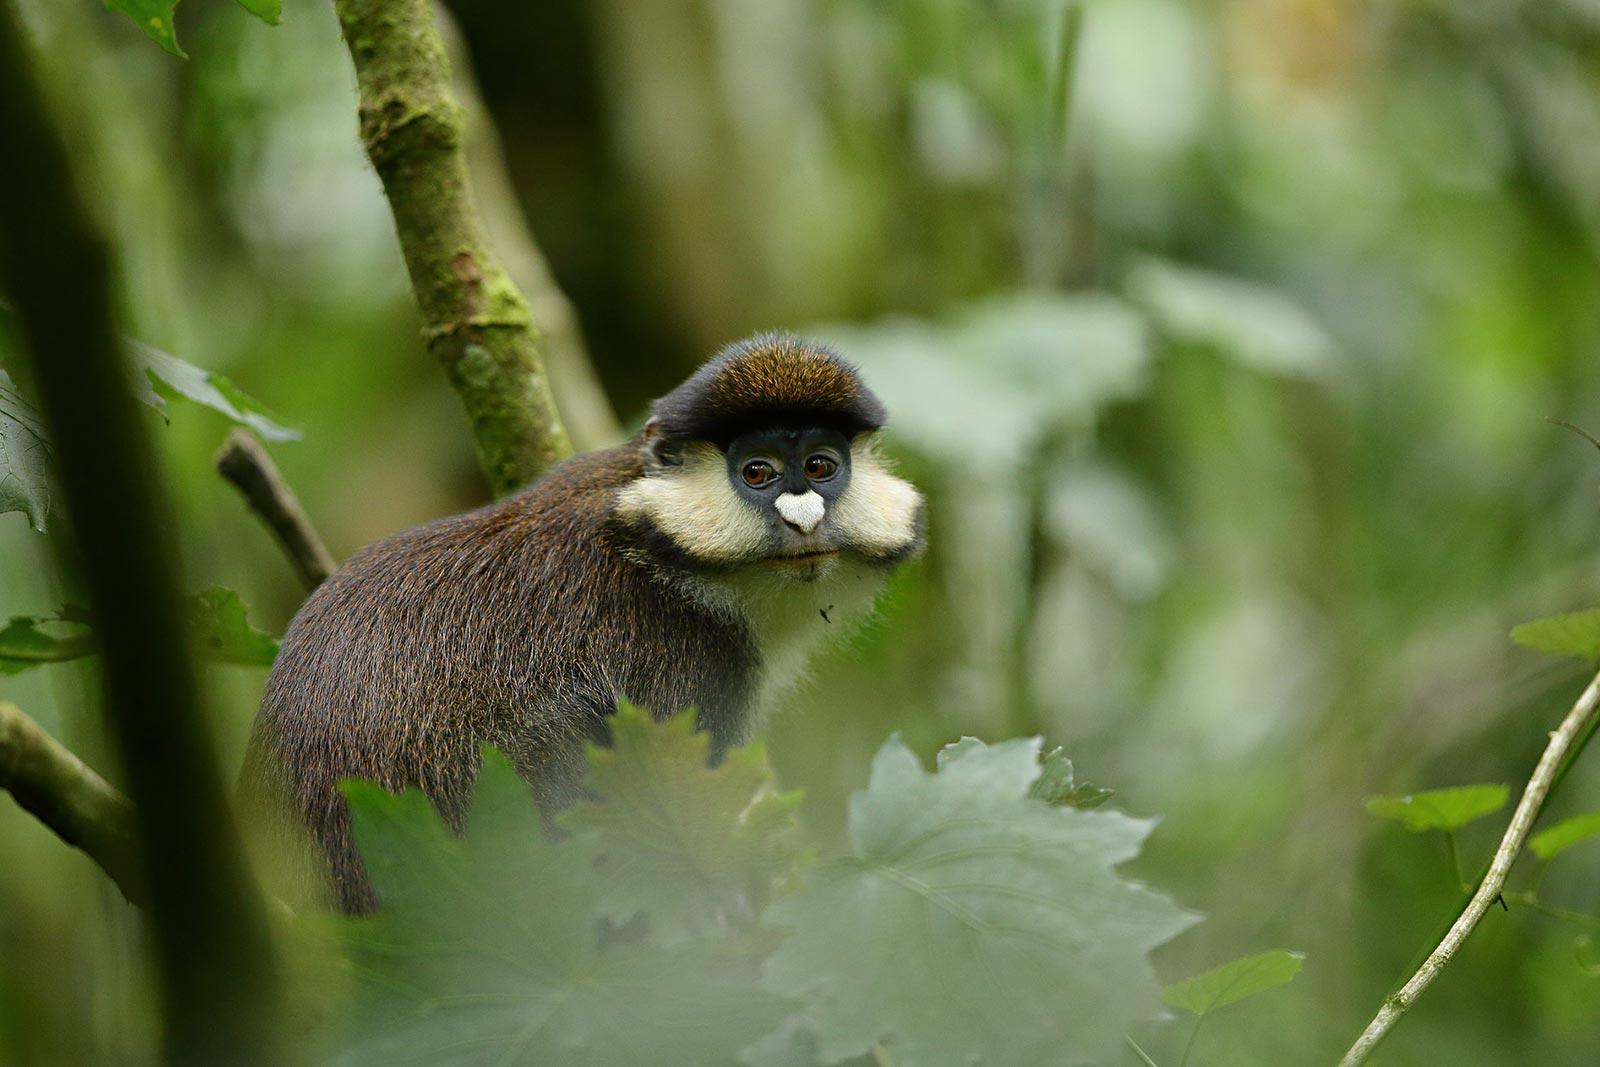 red-tailed monkey uganda; Uganda safari photography tips